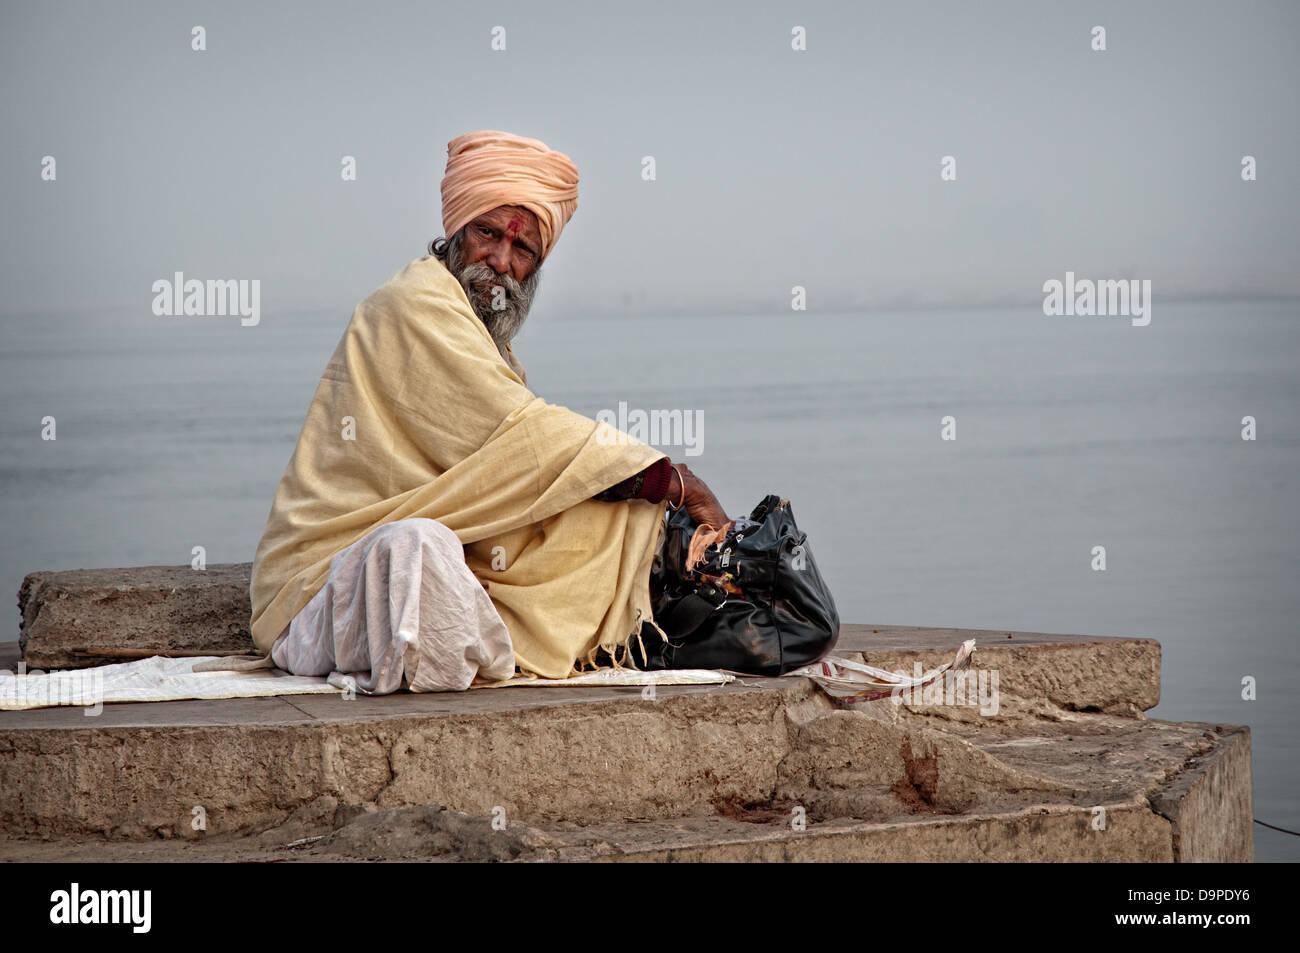 Sadhu on the gaths. Varanasi, Benares, Uttar Pradesh, India - Stock Image